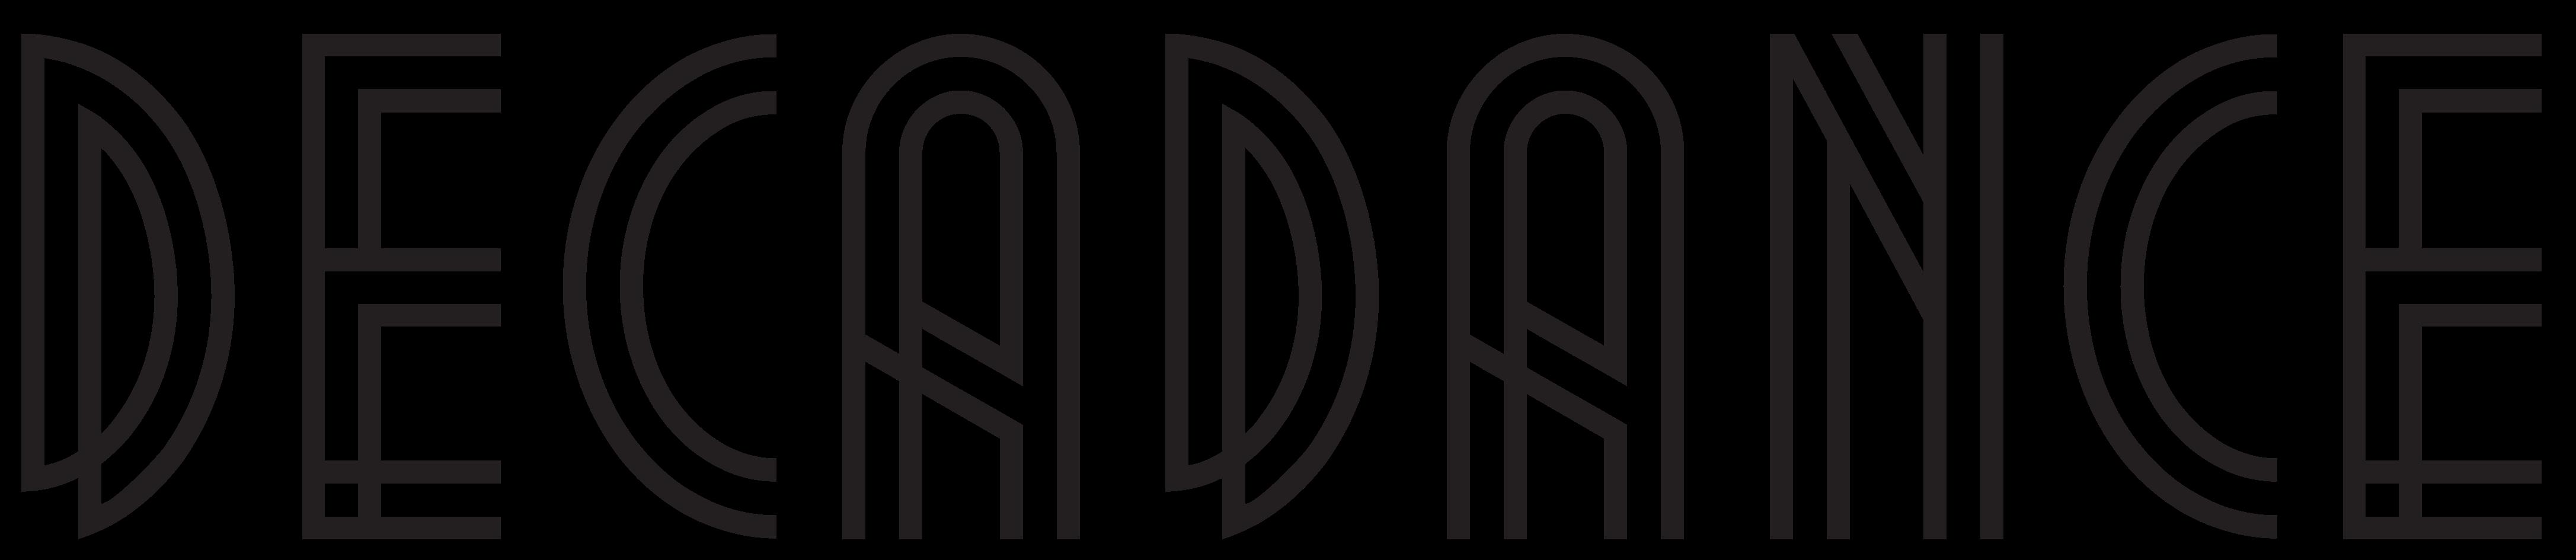 Decadance Bar